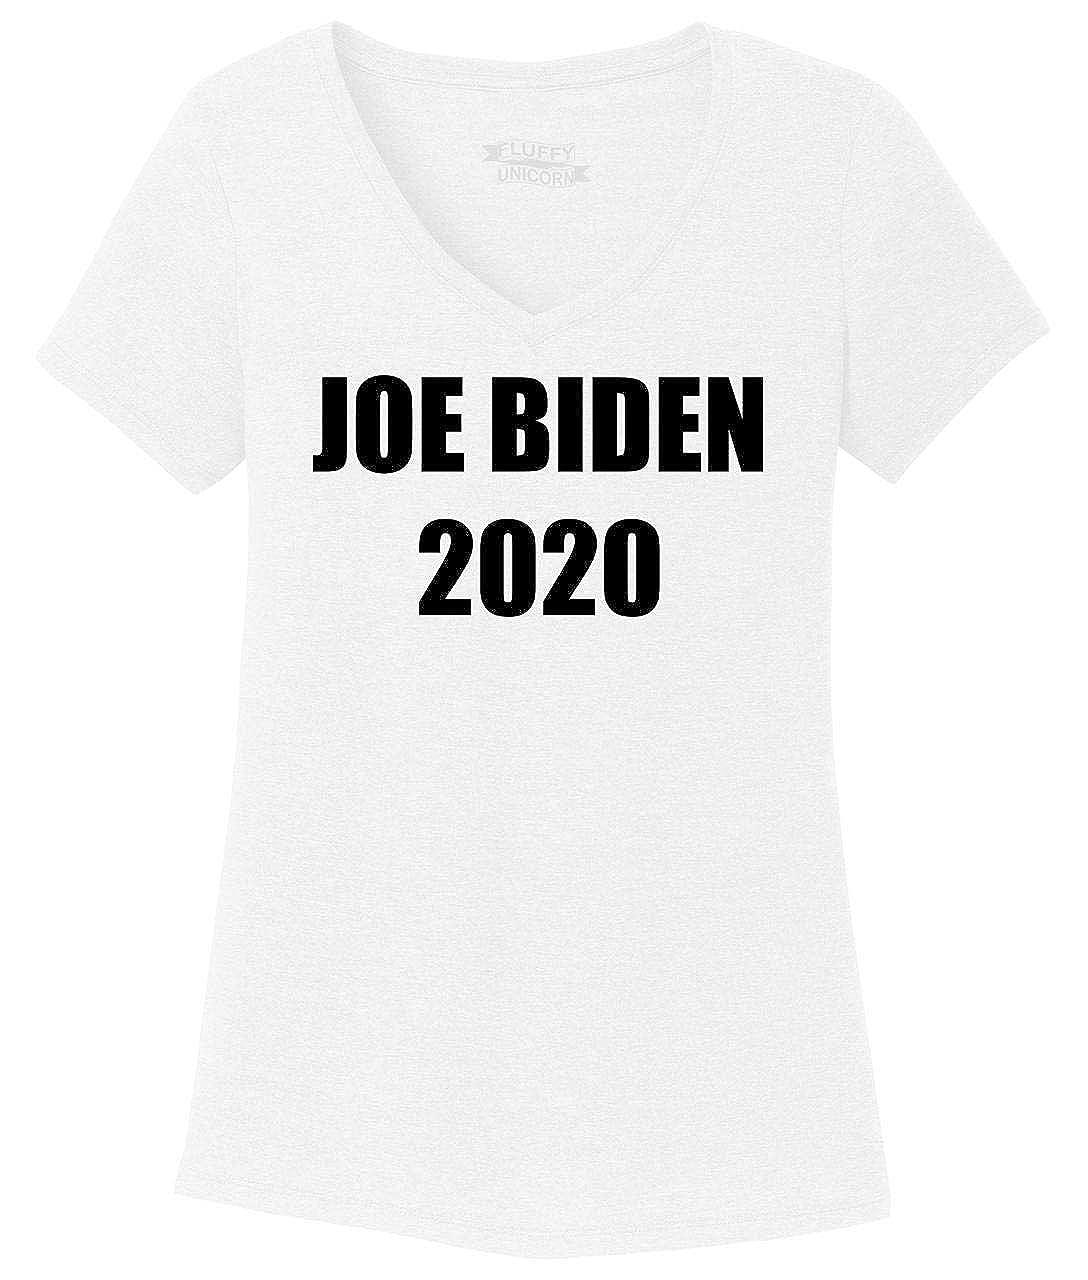 Comical Shirt Ladies Joe Biden 2020 Triblend V-Neck